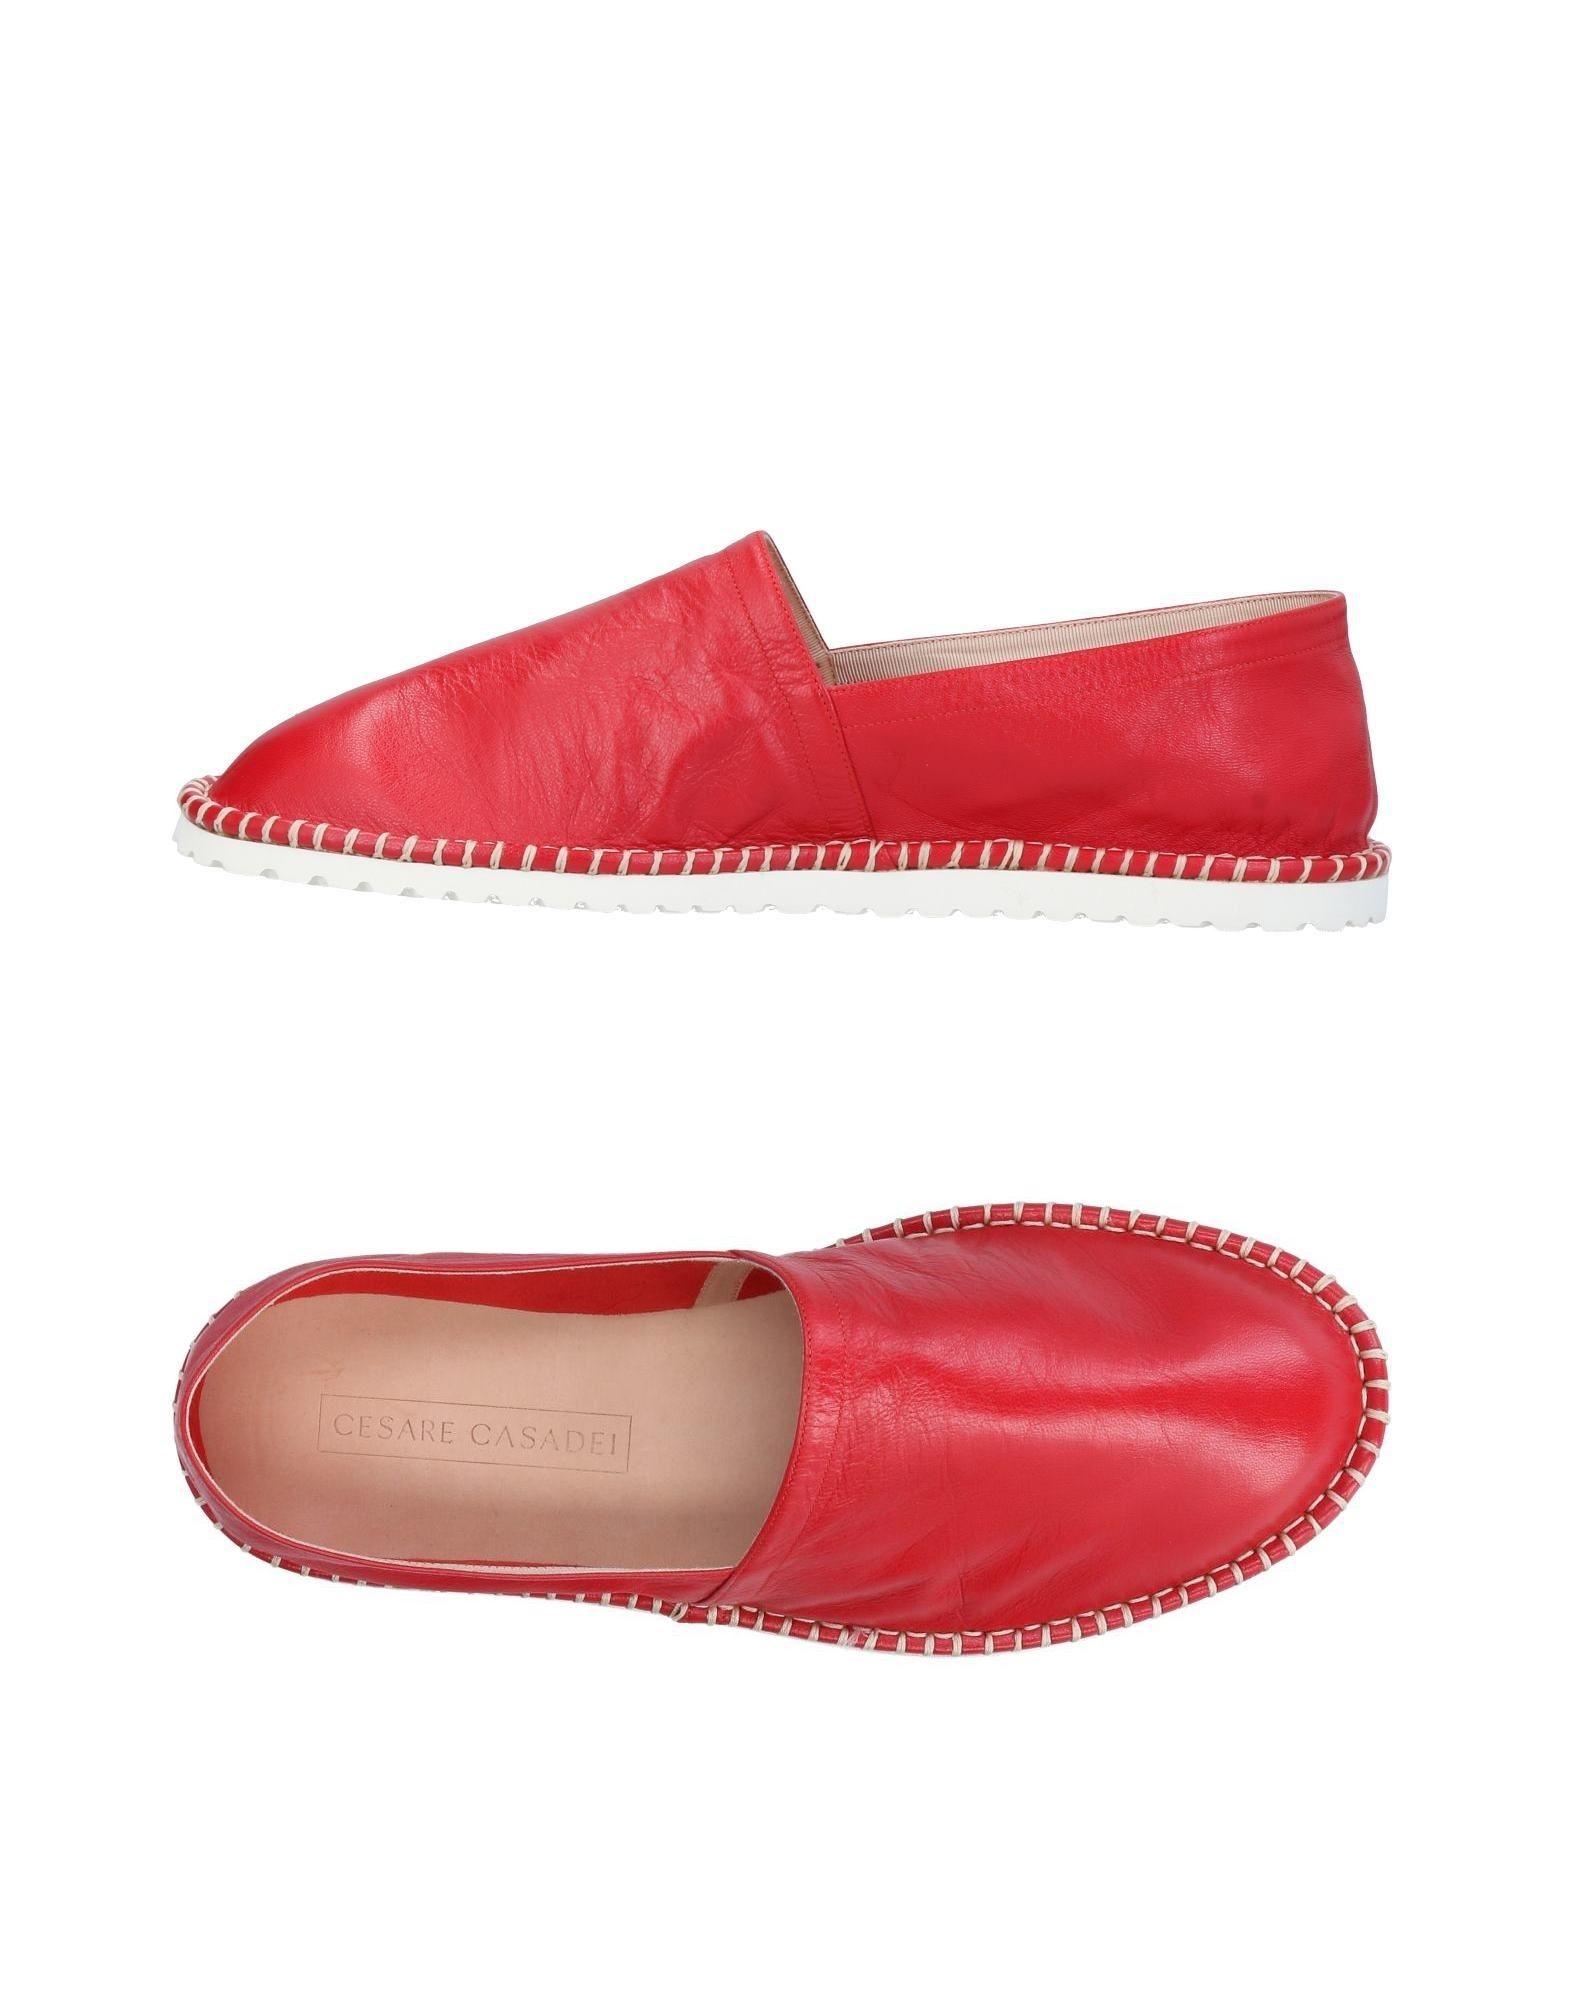 Cesare Casadei Espadrilles Herren  11450877IW Gute Qualität beliebte Schuhe